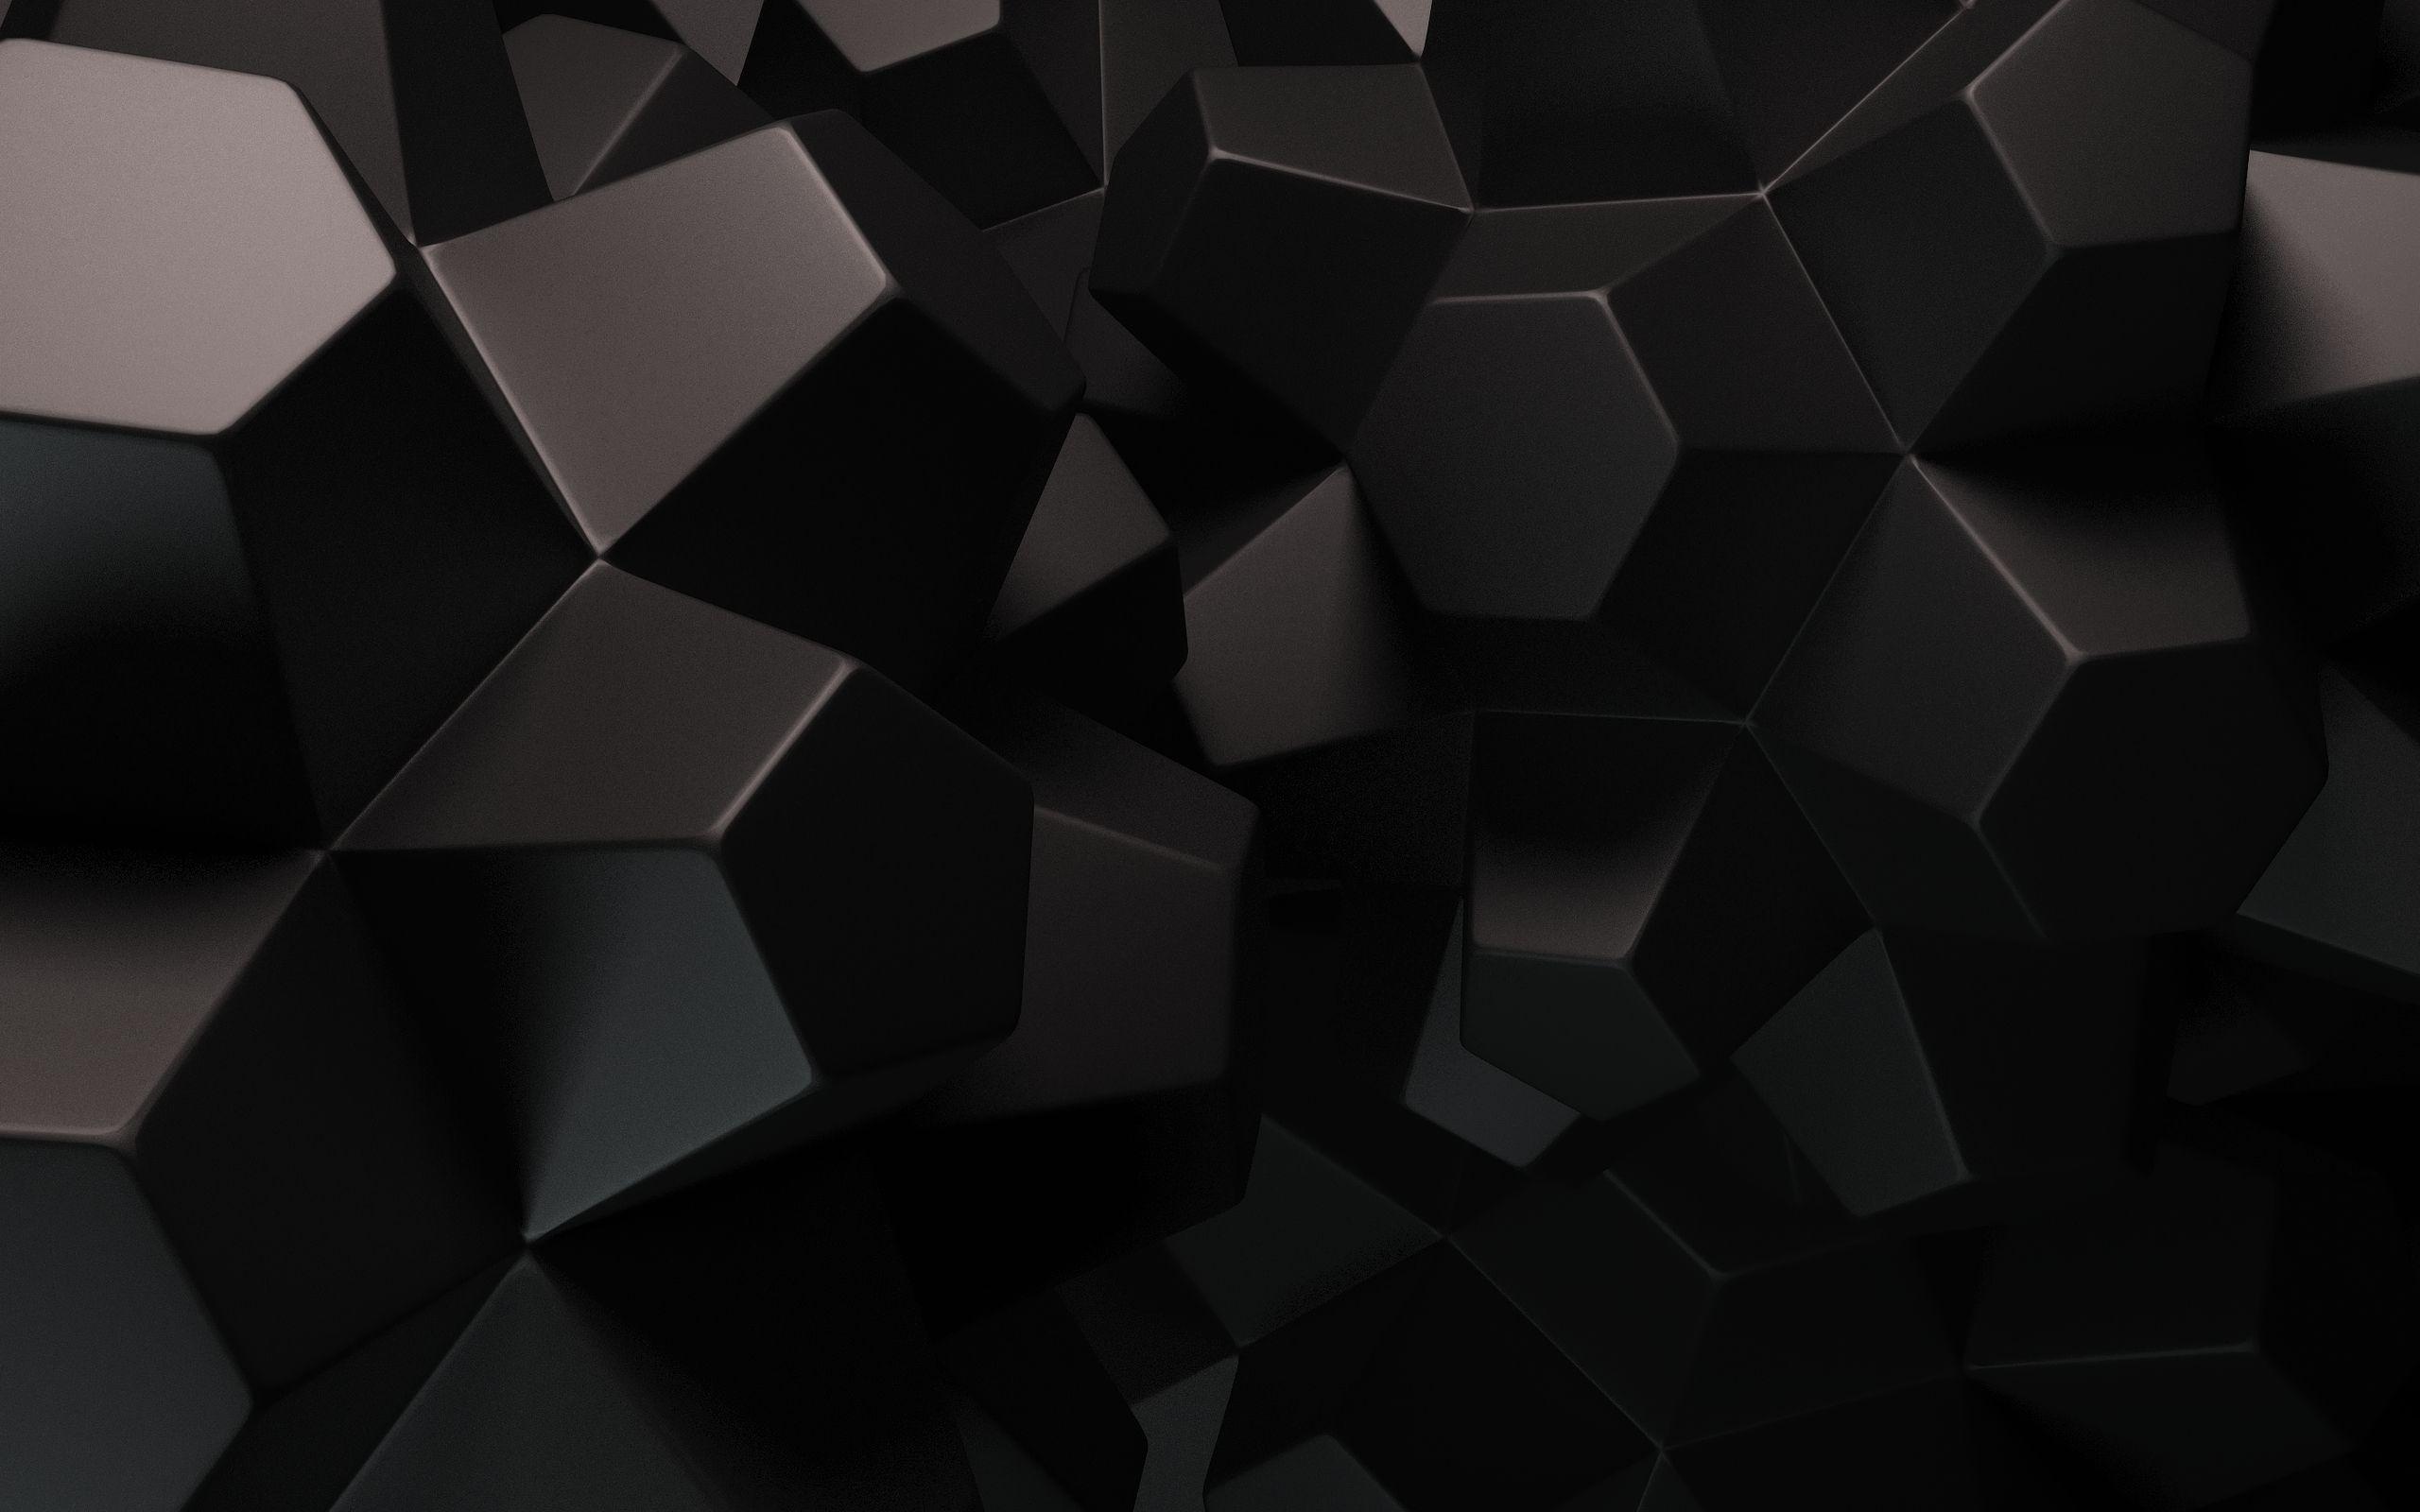 3d cubes hd wallpaper arts and design pinterest hd for 3d wallpaper hd for wall